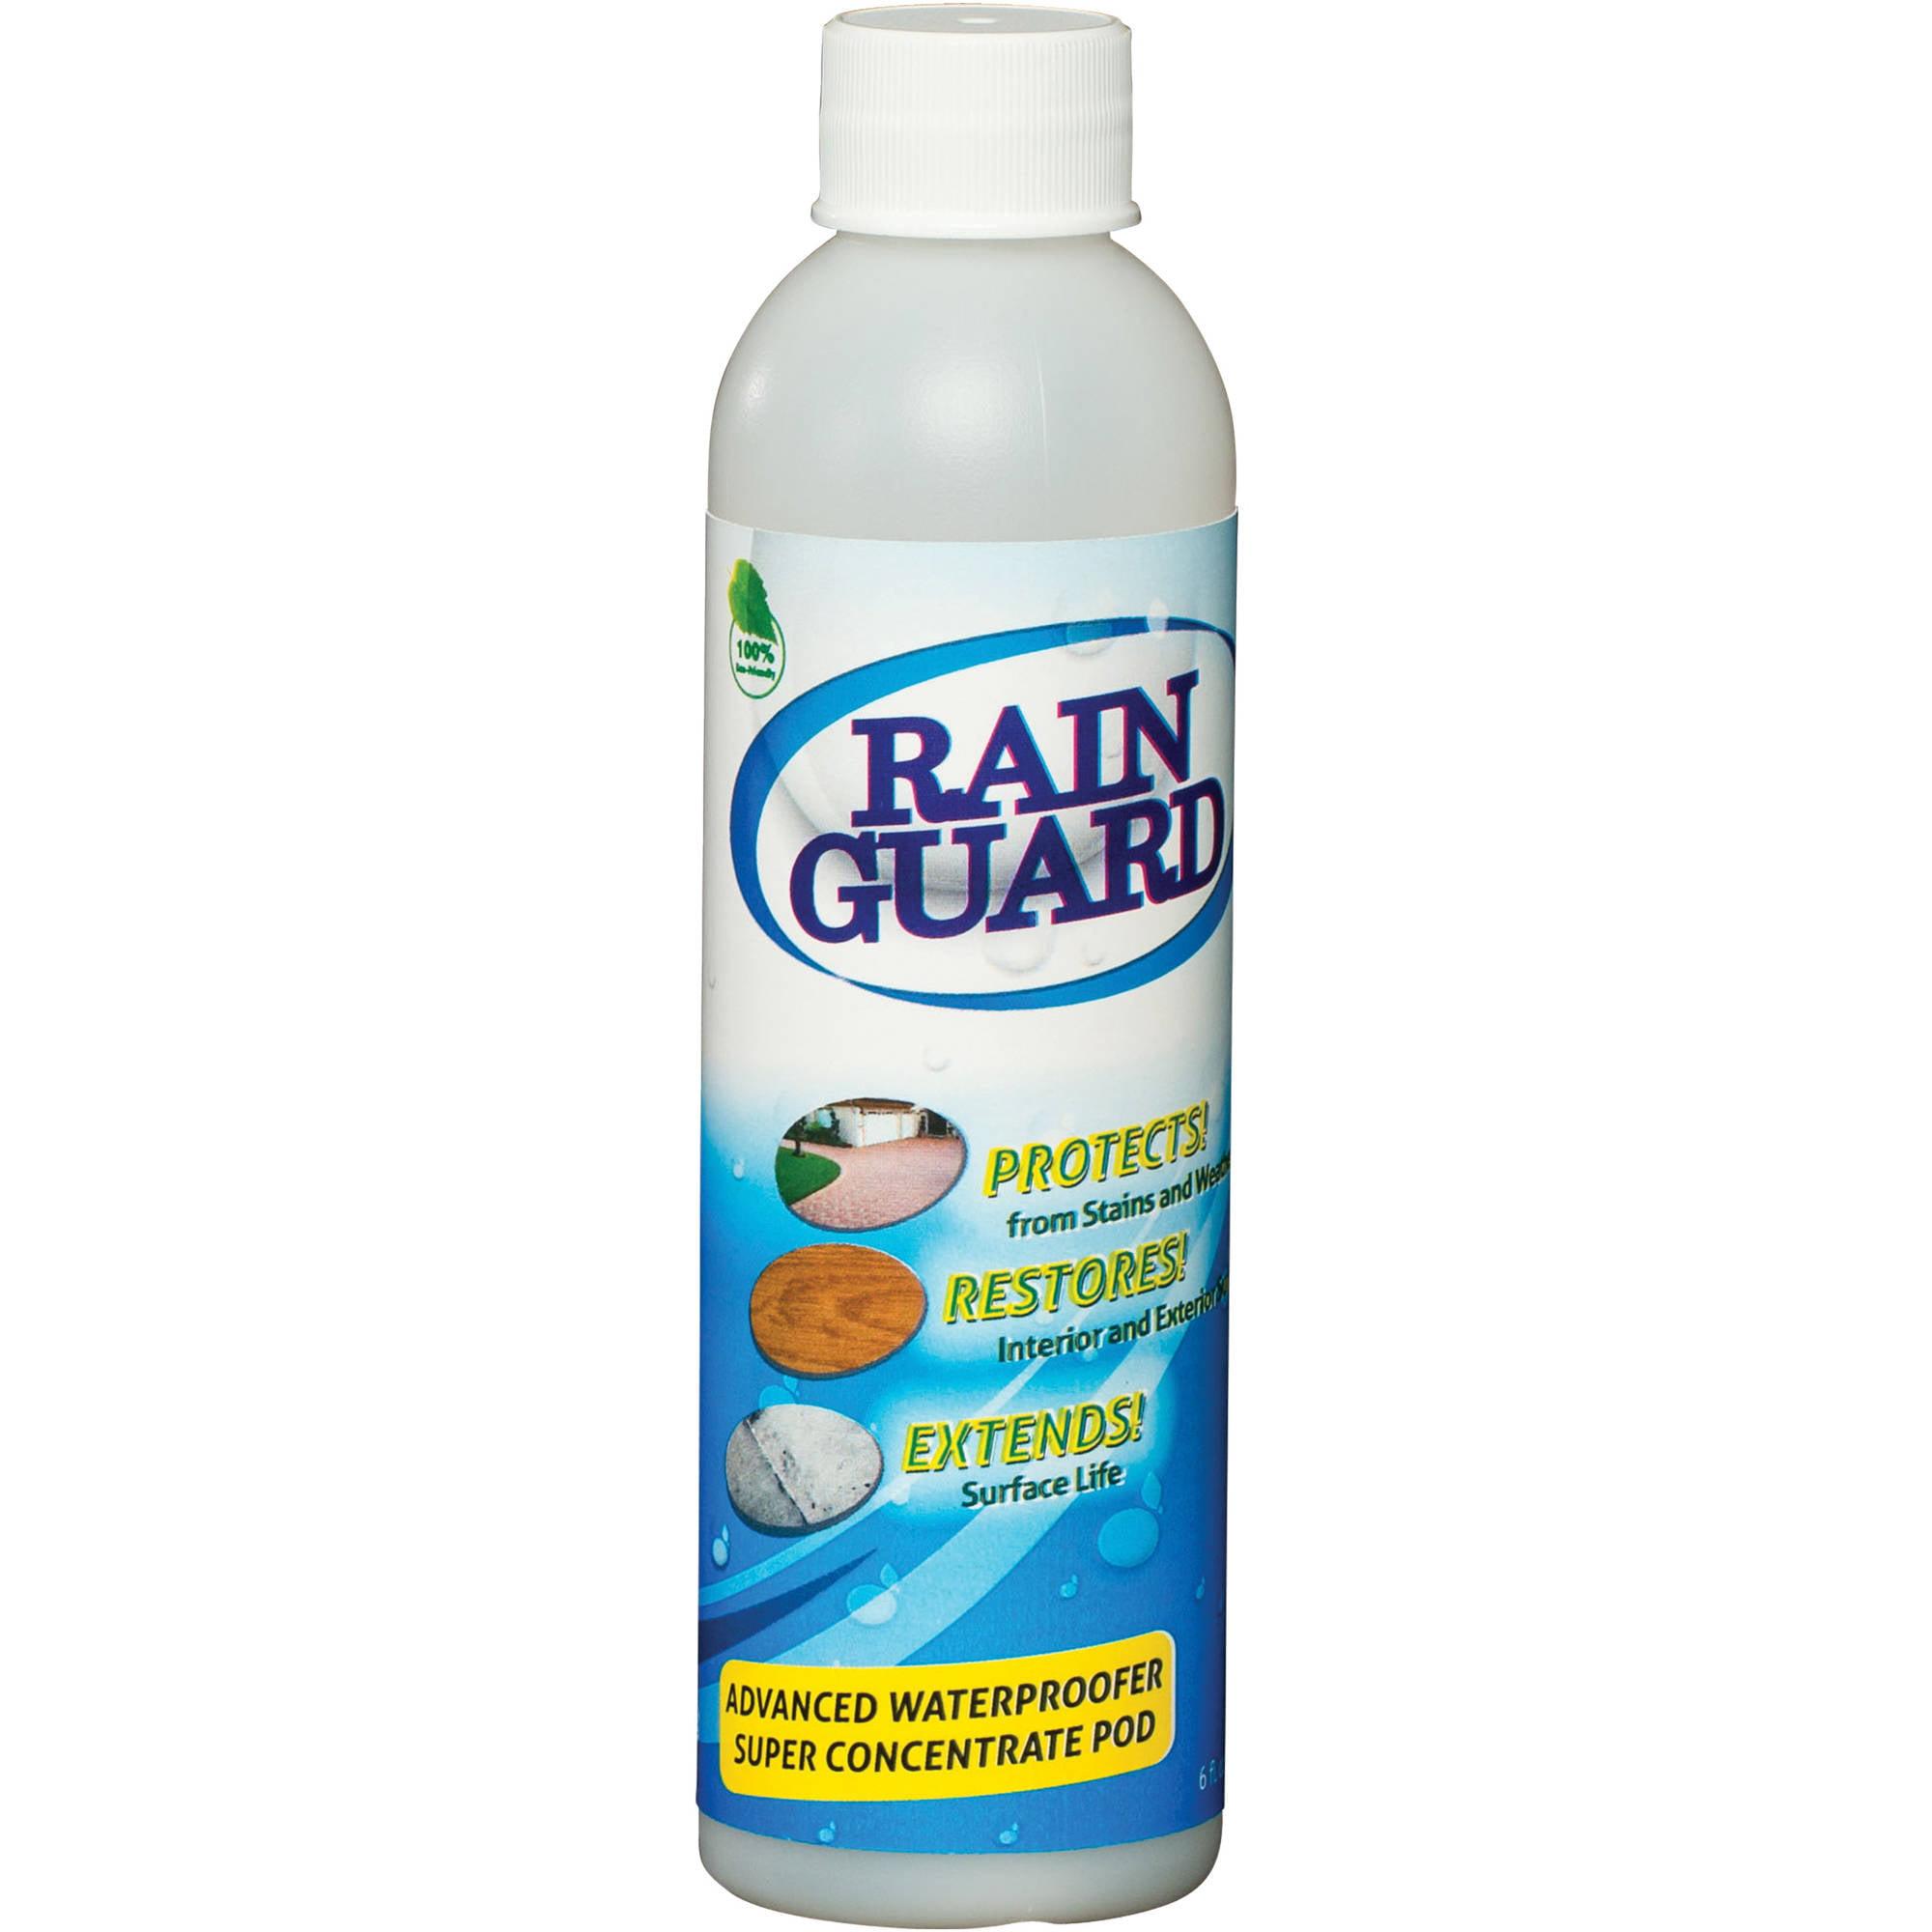 Image of Rainguard Advanced Waterproofer eco-pod, 6 oz